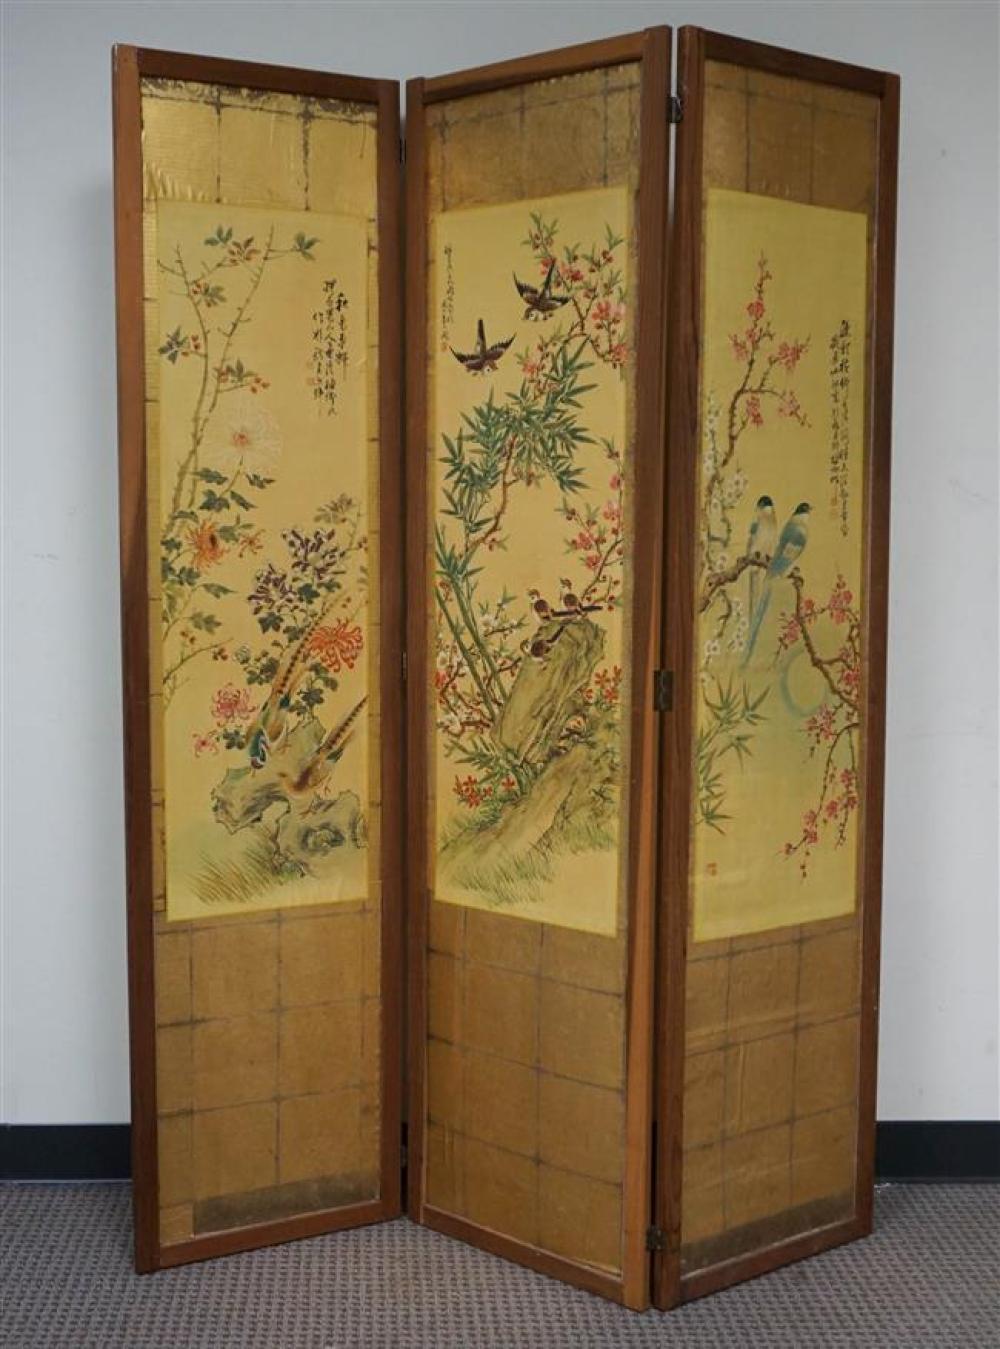 Japanese Three-Fold Floor Screen; 65.25 x 48.75 HW Inches